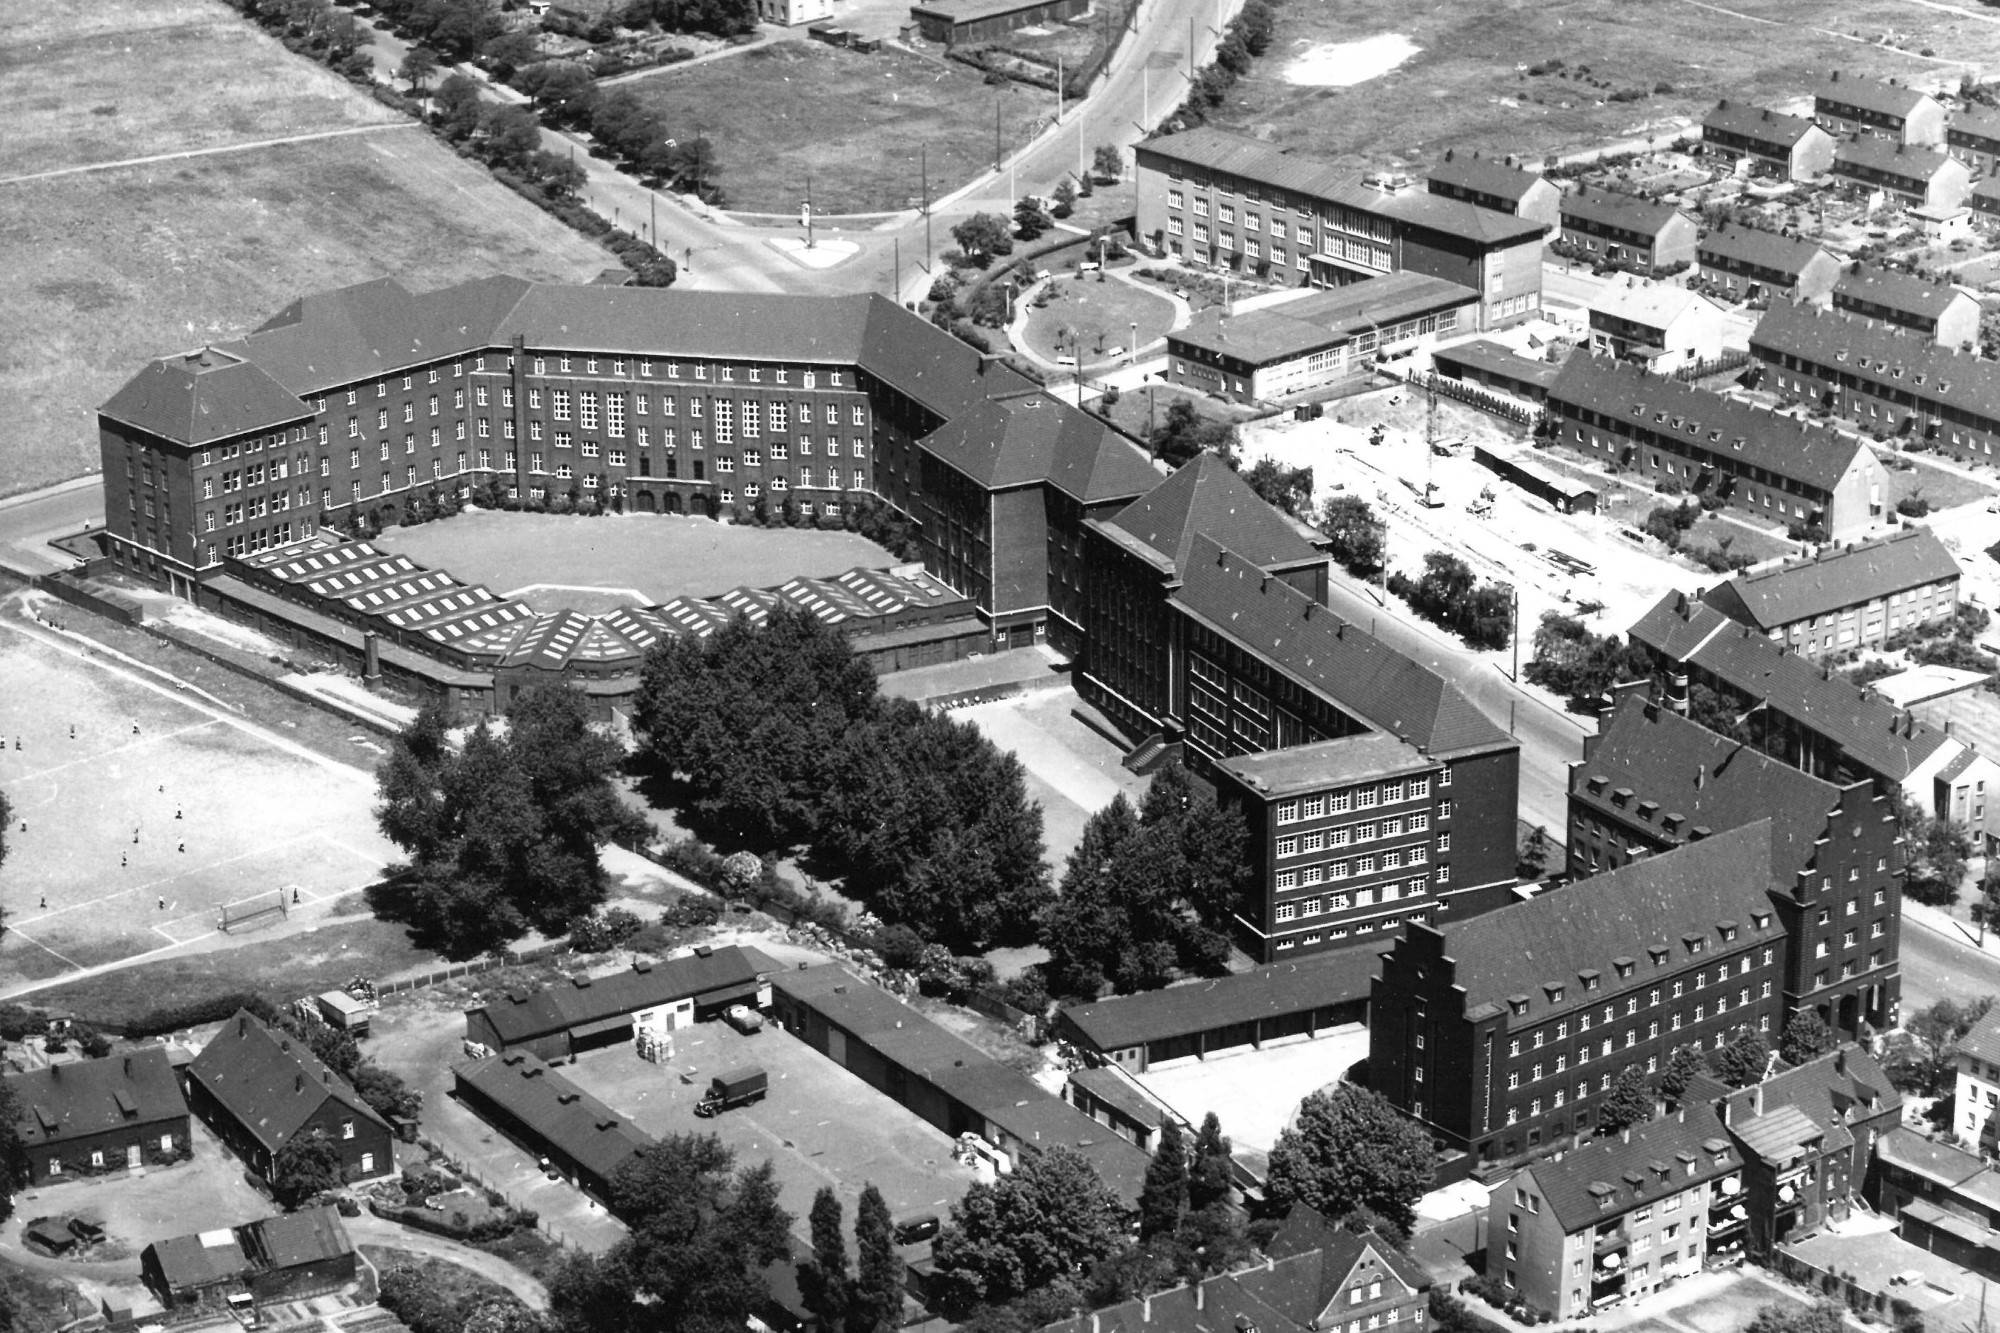 Duisburg Hamborn 1959